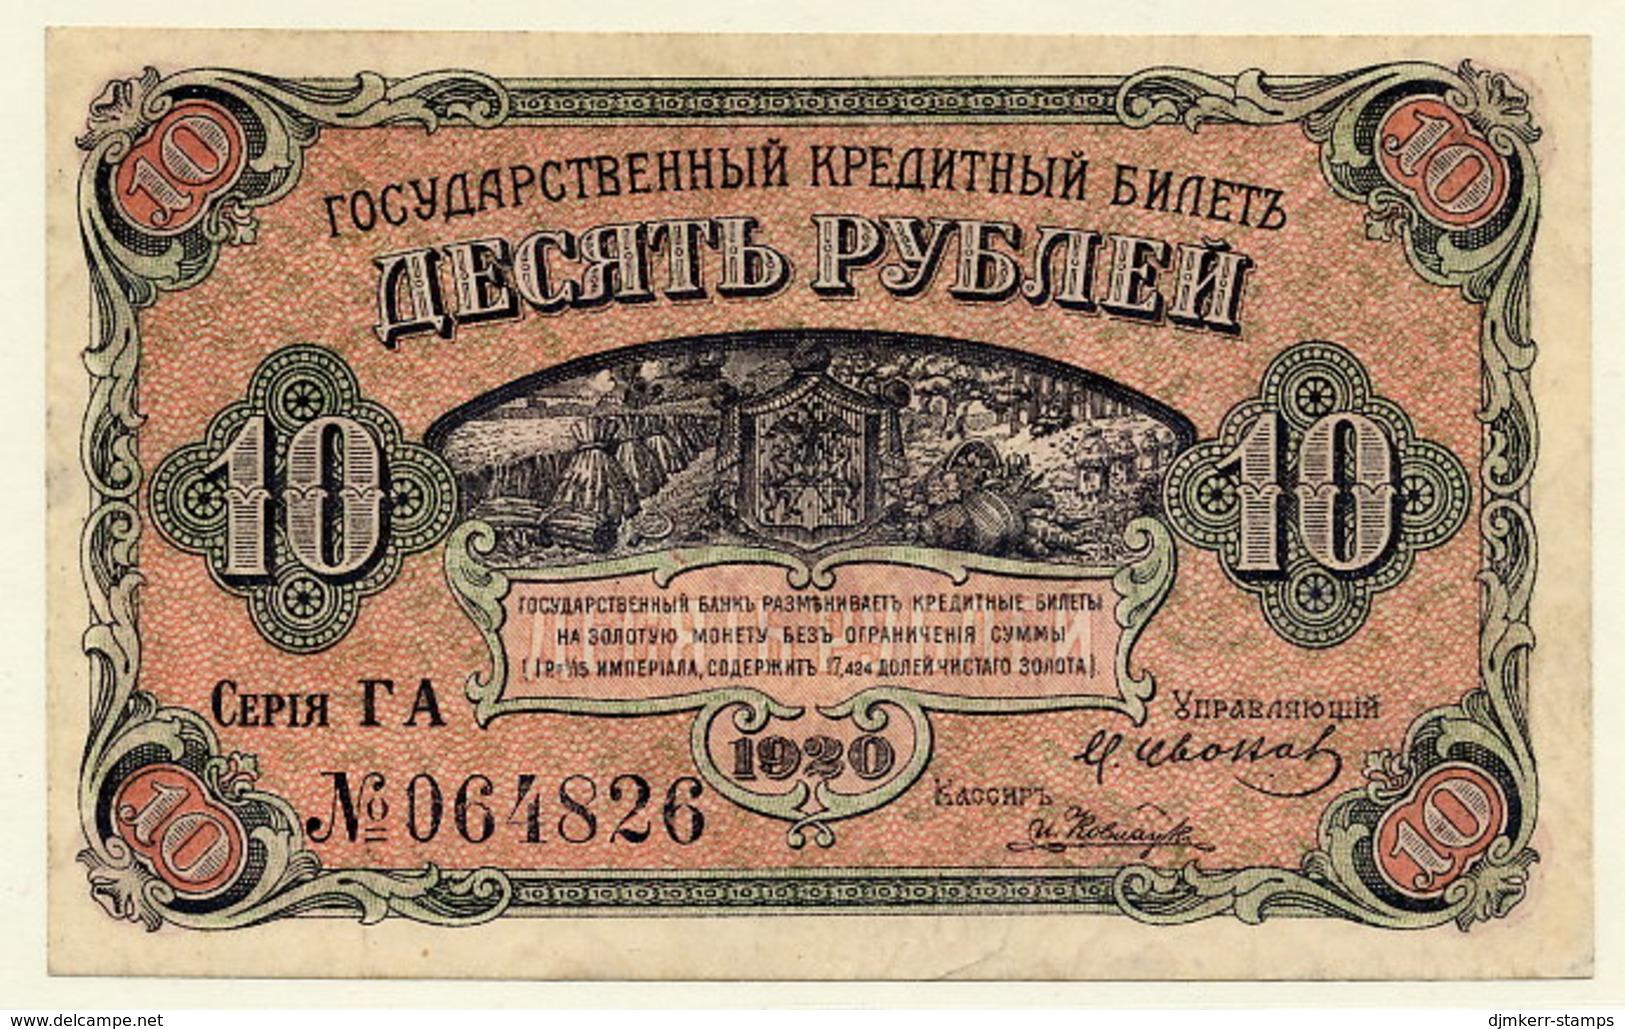 EAST SIBERIA (Priamur Provisional Government) 1920 10 Rub.  UNC S1247 - Russland